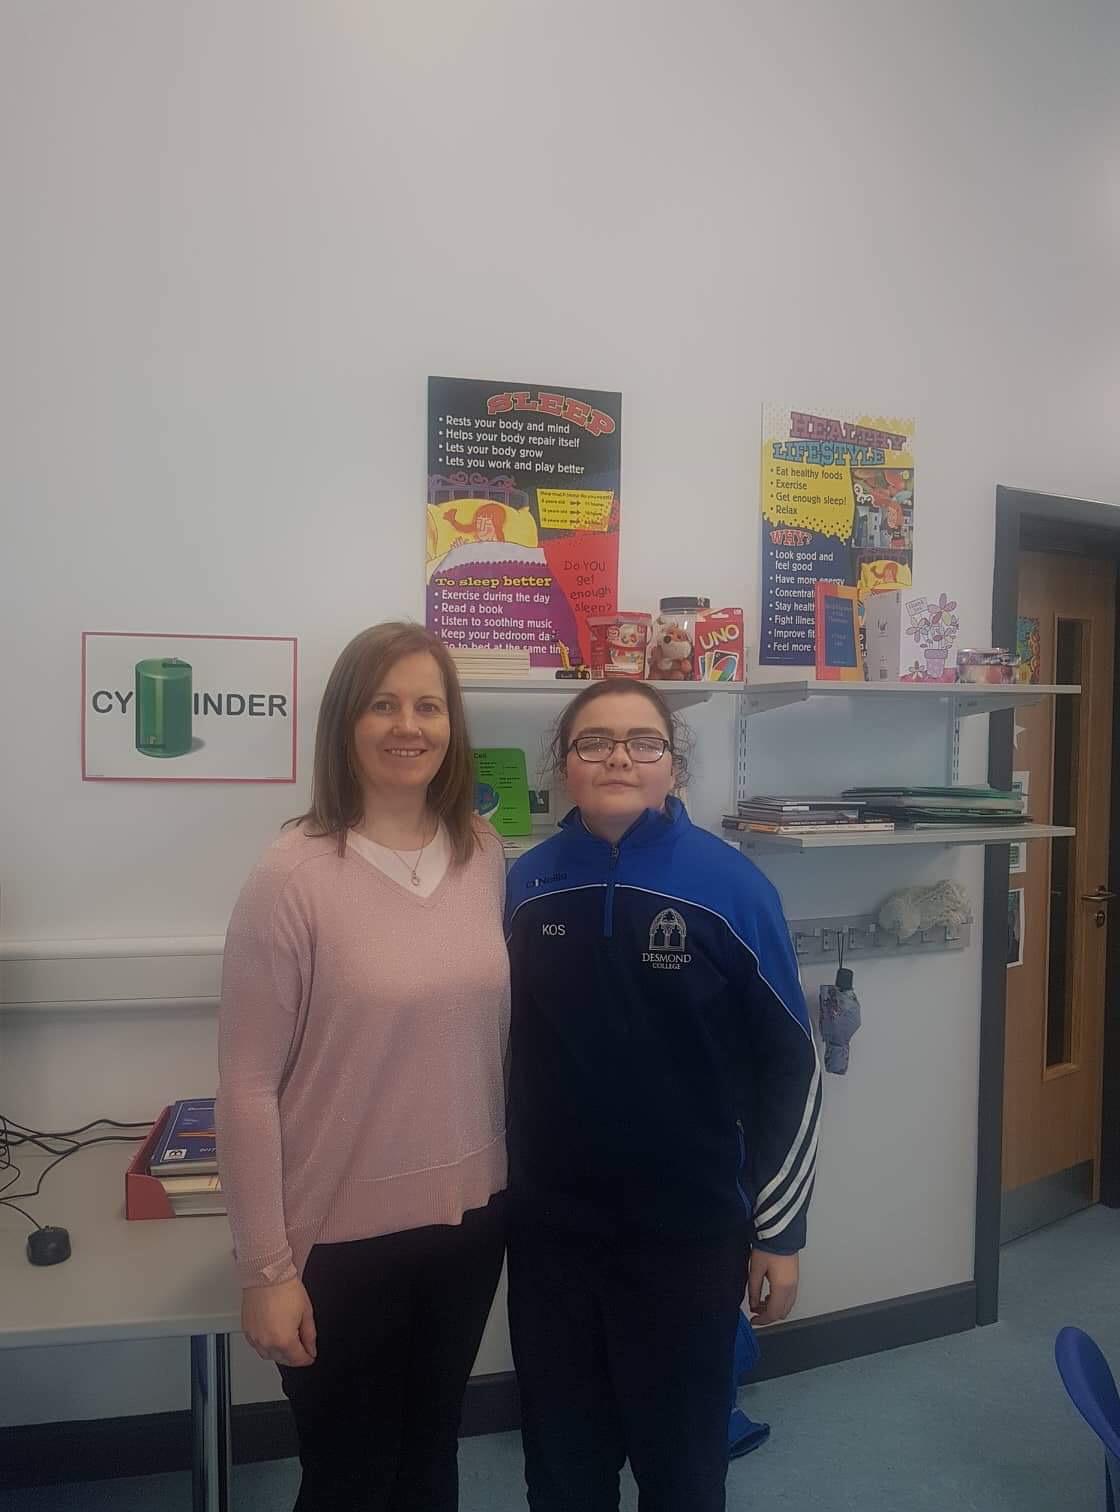 Nuala O'Callaghan and Kathlyn O'Sullivan during the production of the school Calendar